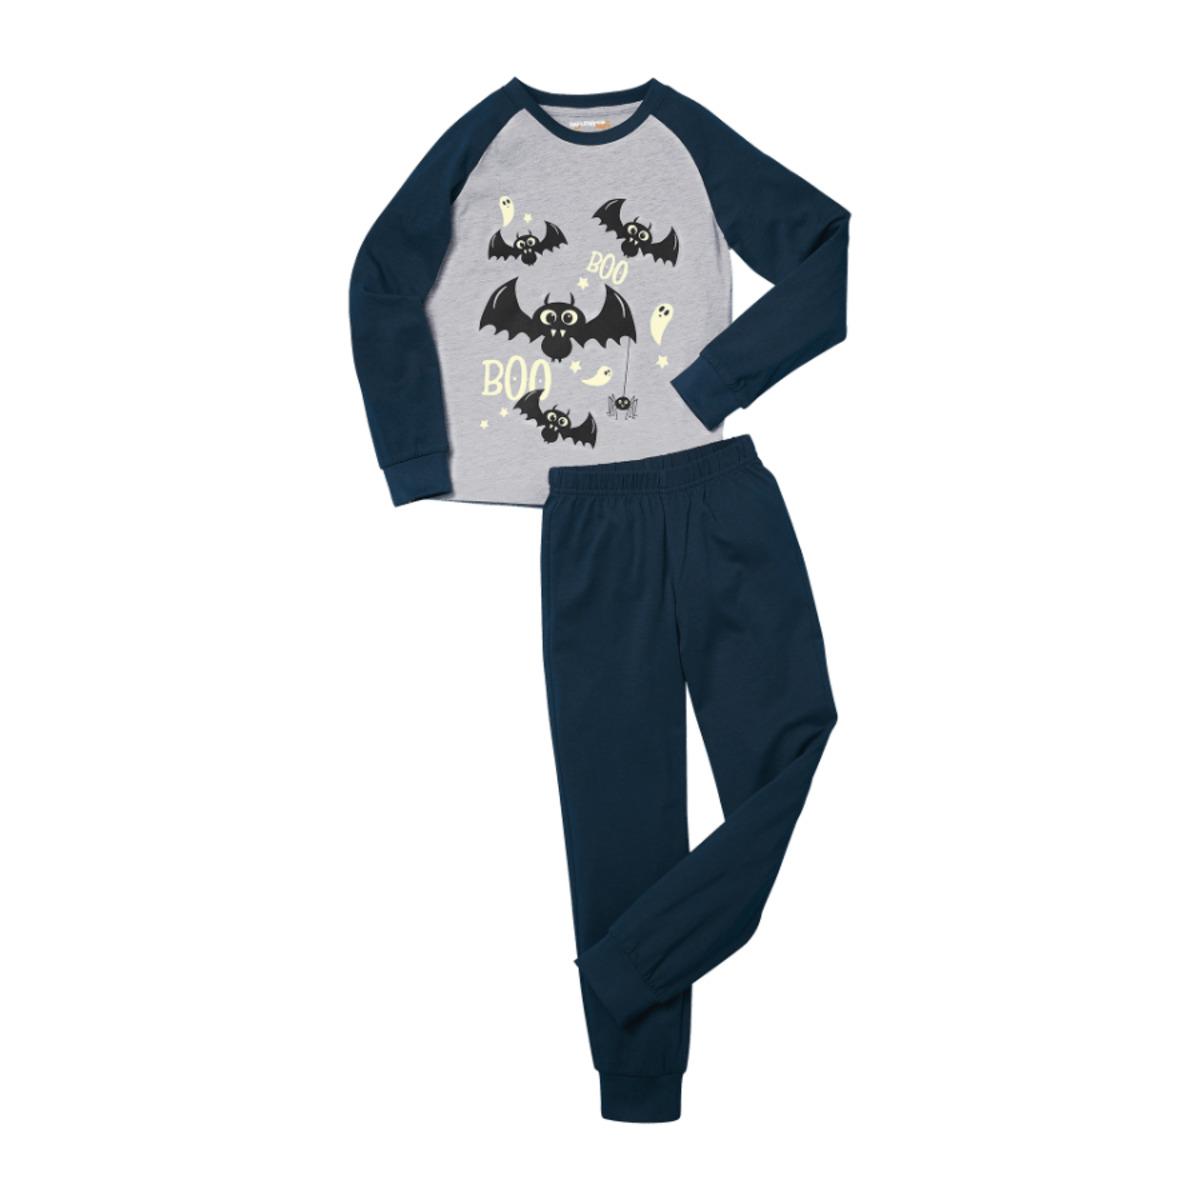 Bild 5 von POCOPIANO     Halloween-Pyjama, glow in the dark